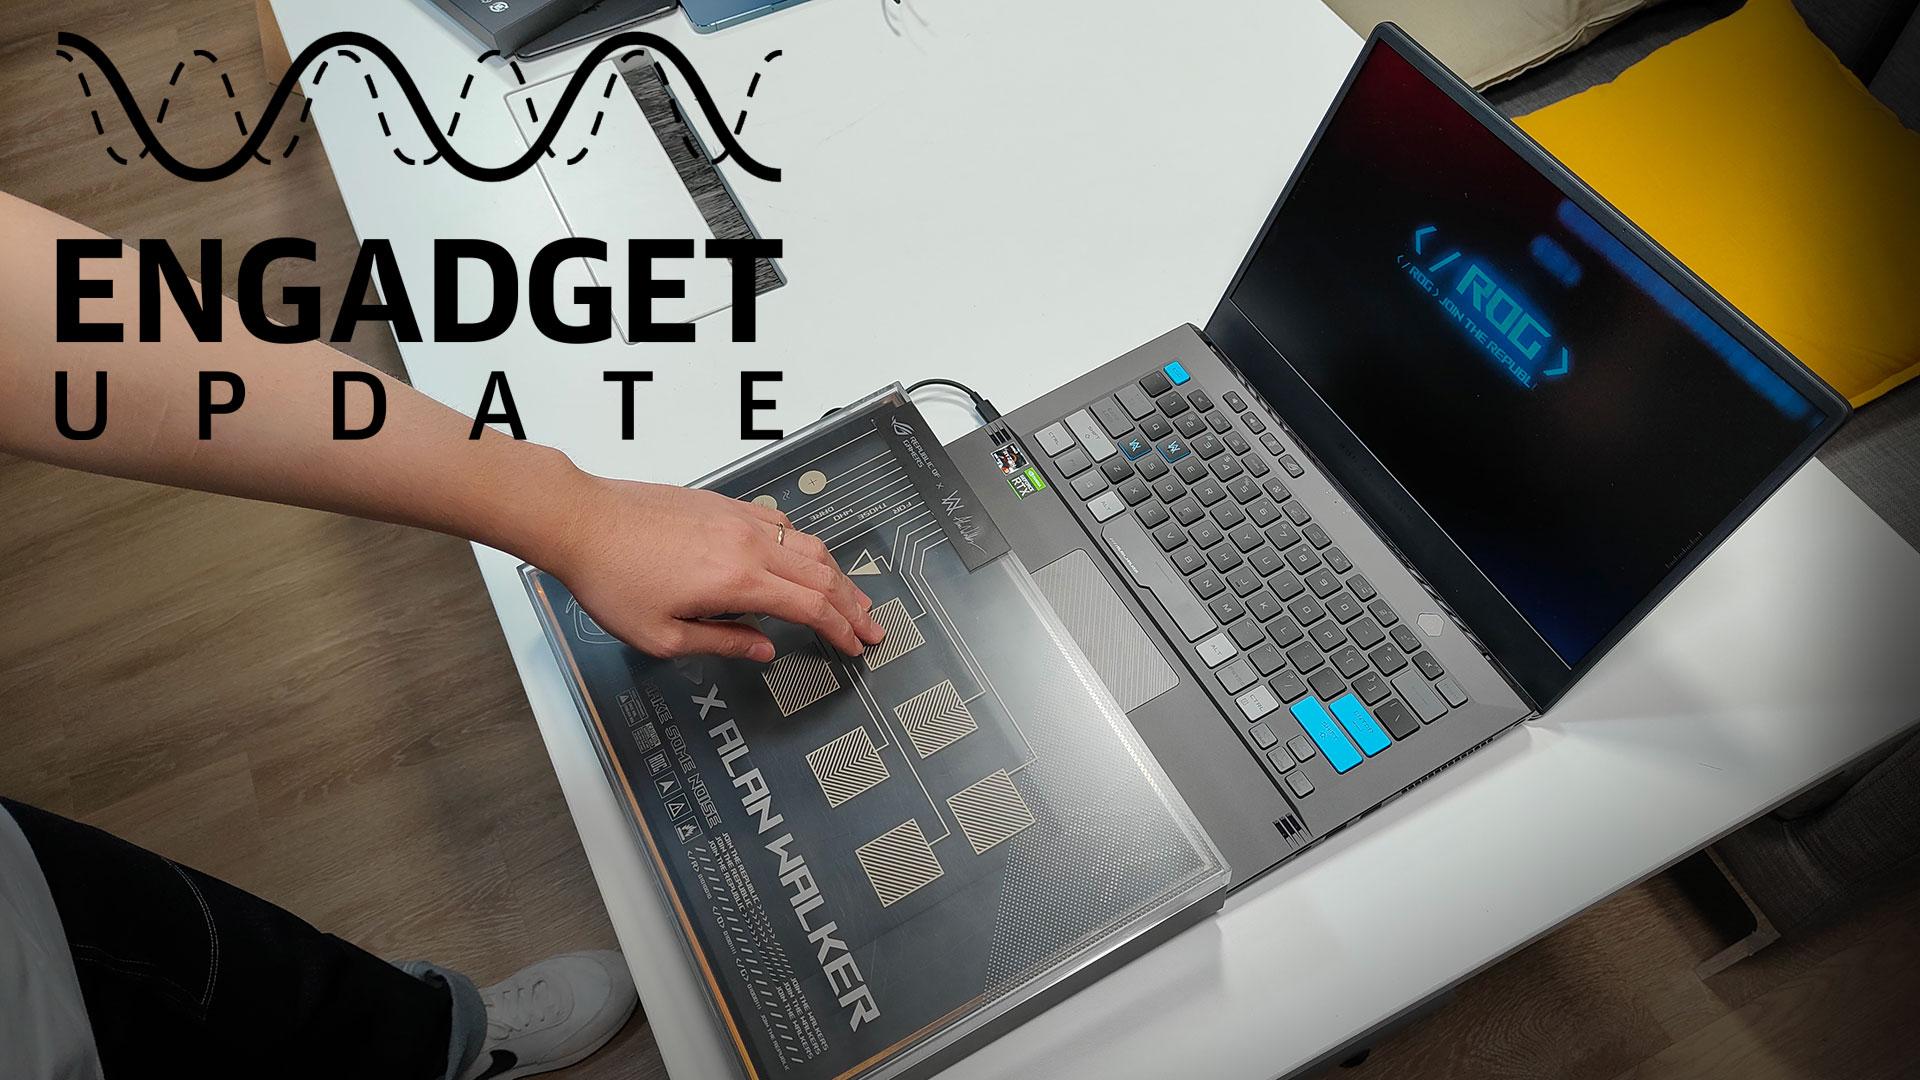 ASUS 的筆電設計都相當具特色,今天 Engadget Update 節目就為大家開箱試試看兩款外觀、規格都非常亮眼的機型:ASUS ROG Flow X13、Alan Walker 聯名 Zephyrus G14 AW SE。一款是使用專屬連接盒,讓小小筆電都可以有市場上最強大 GPU RTX 3090 加持;一款就是融入各種炫目元素,讓筆電輕鬆變身 DJ 台!